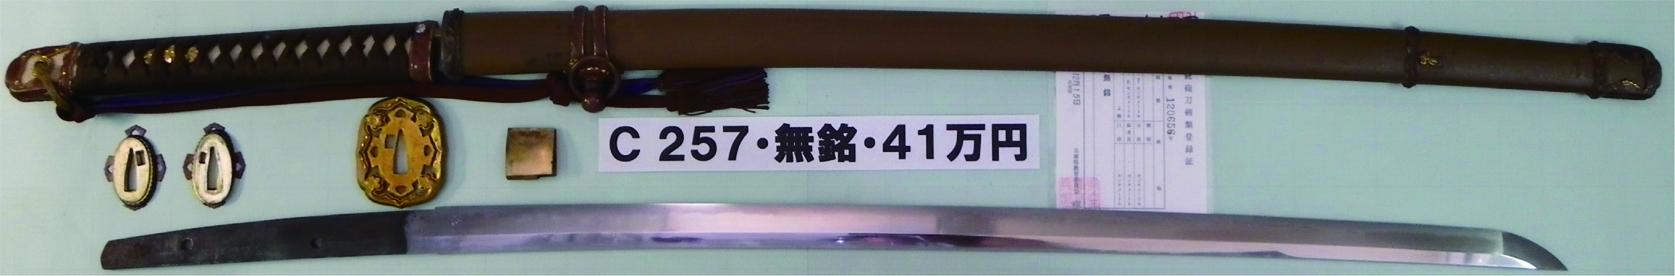 C2257